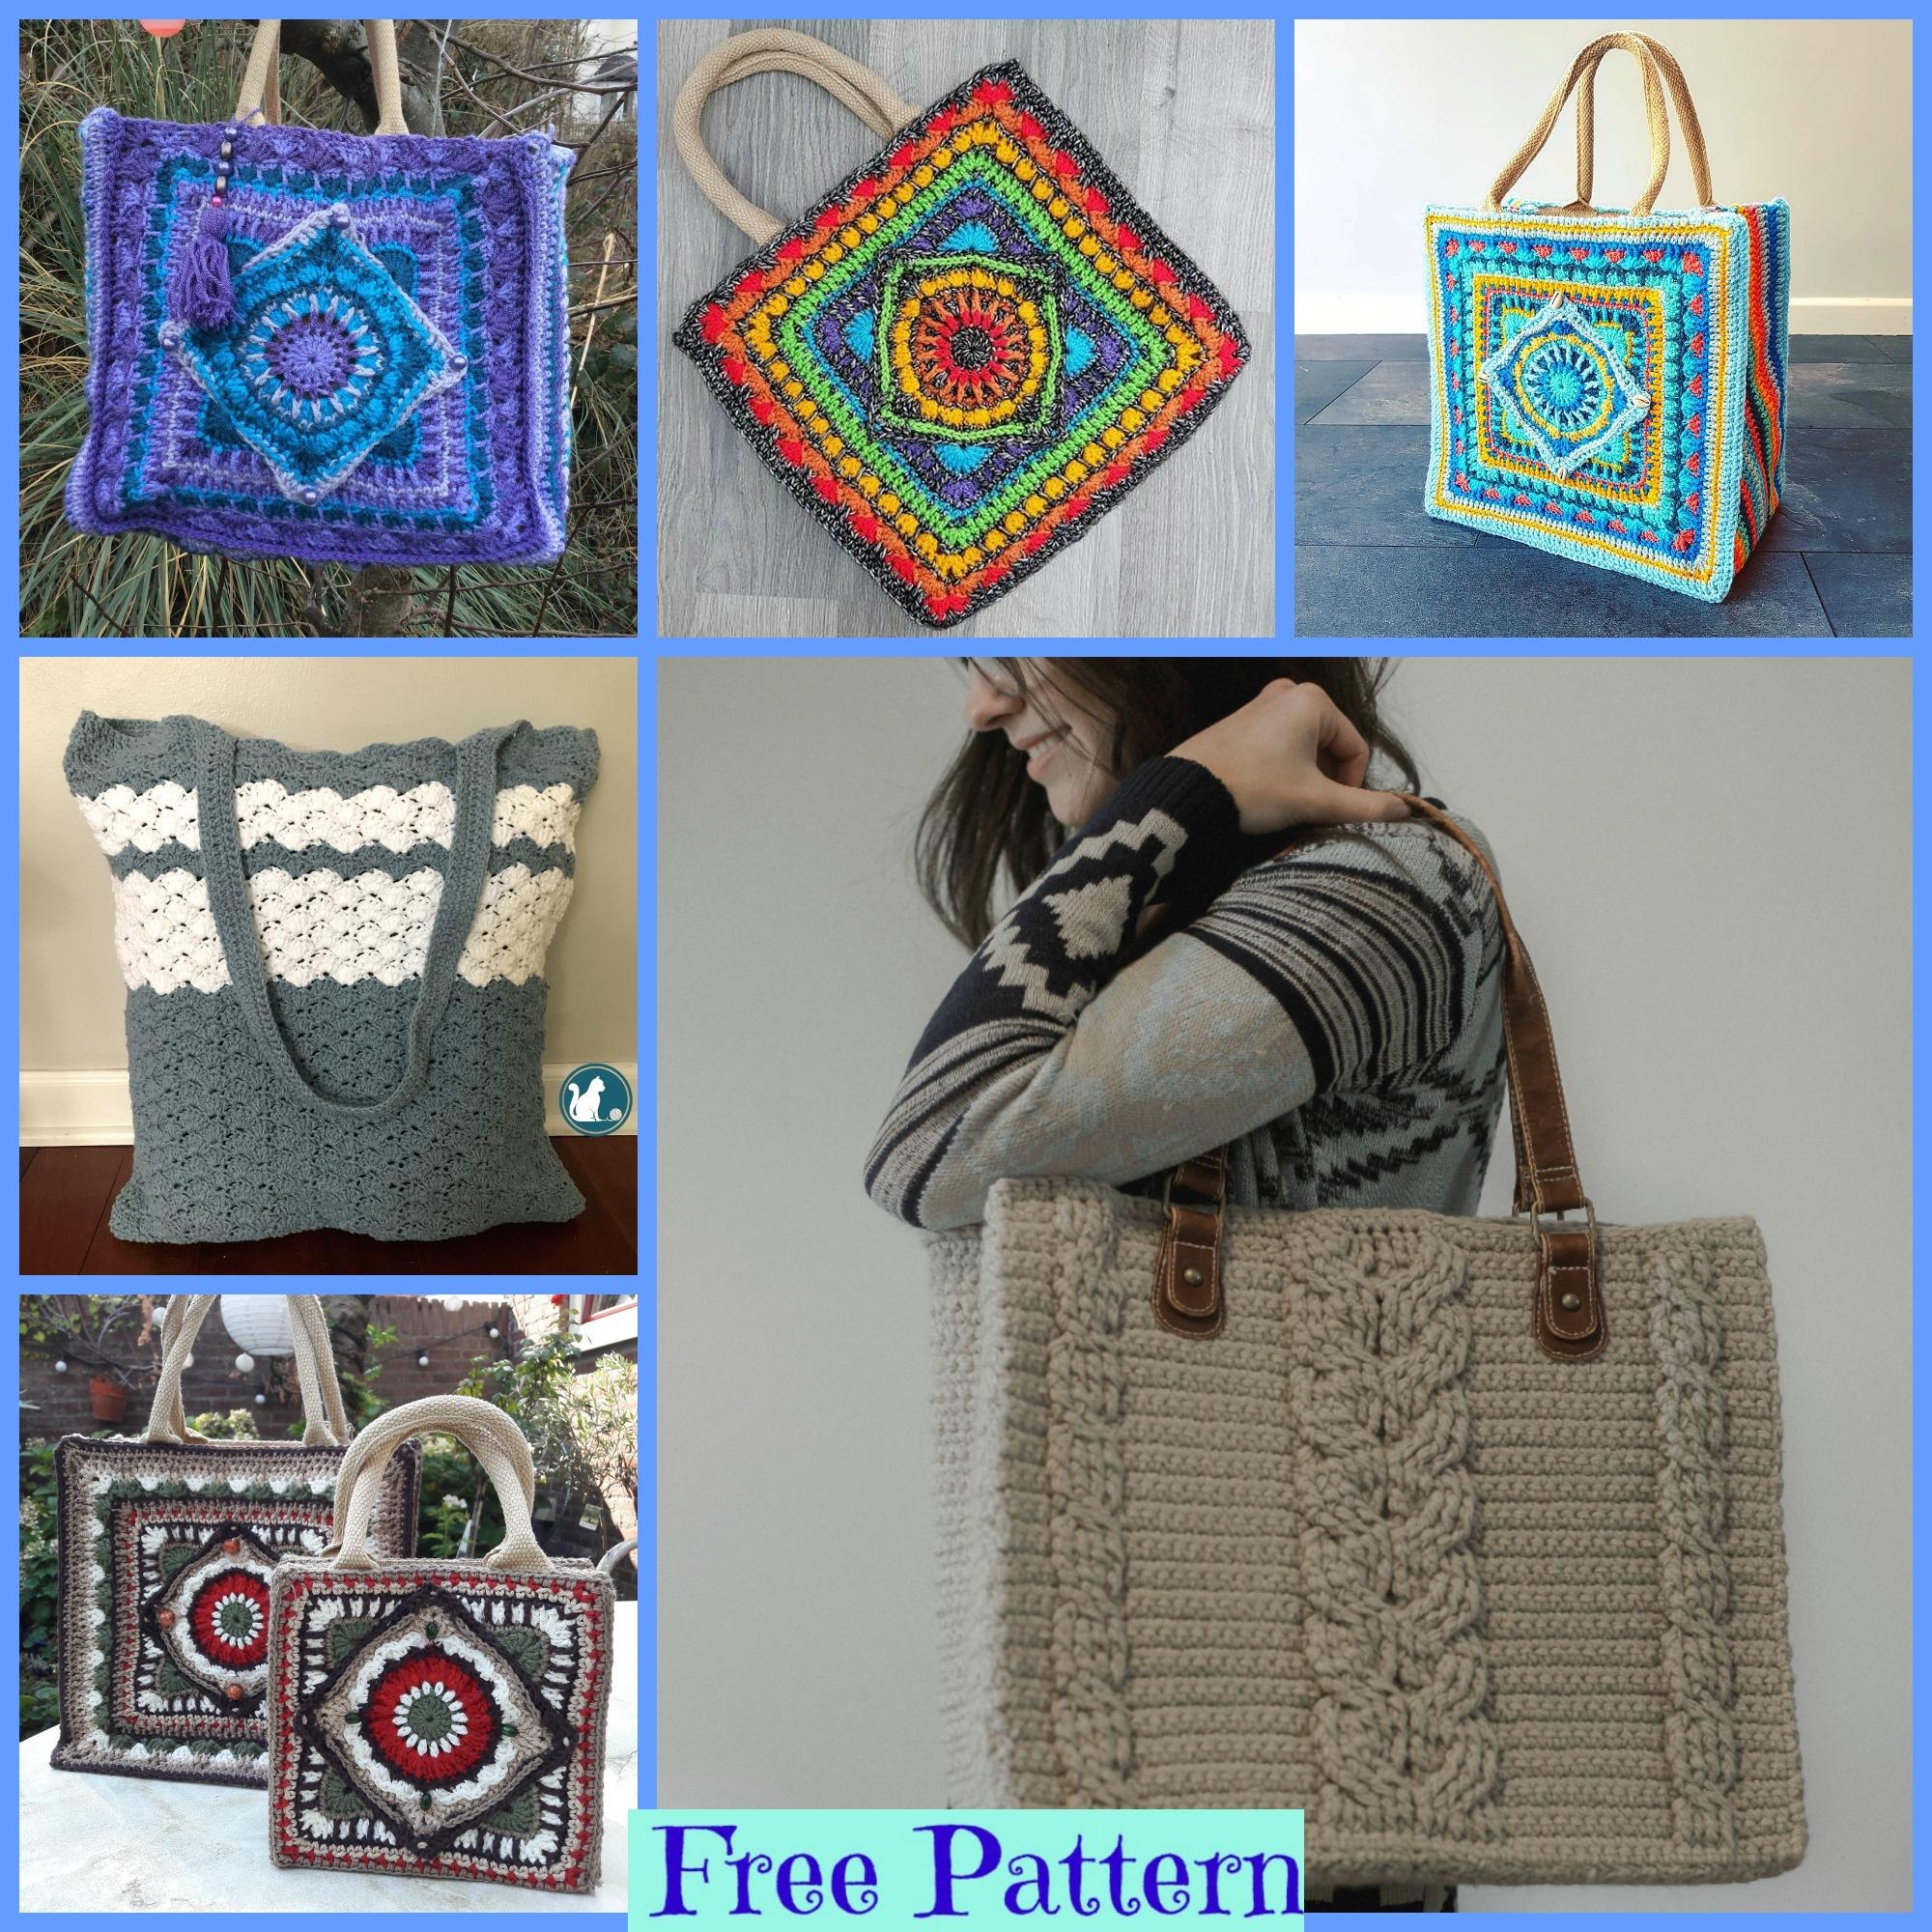 diy4ever-Crochet Unique Tote Bags - Free Patterns